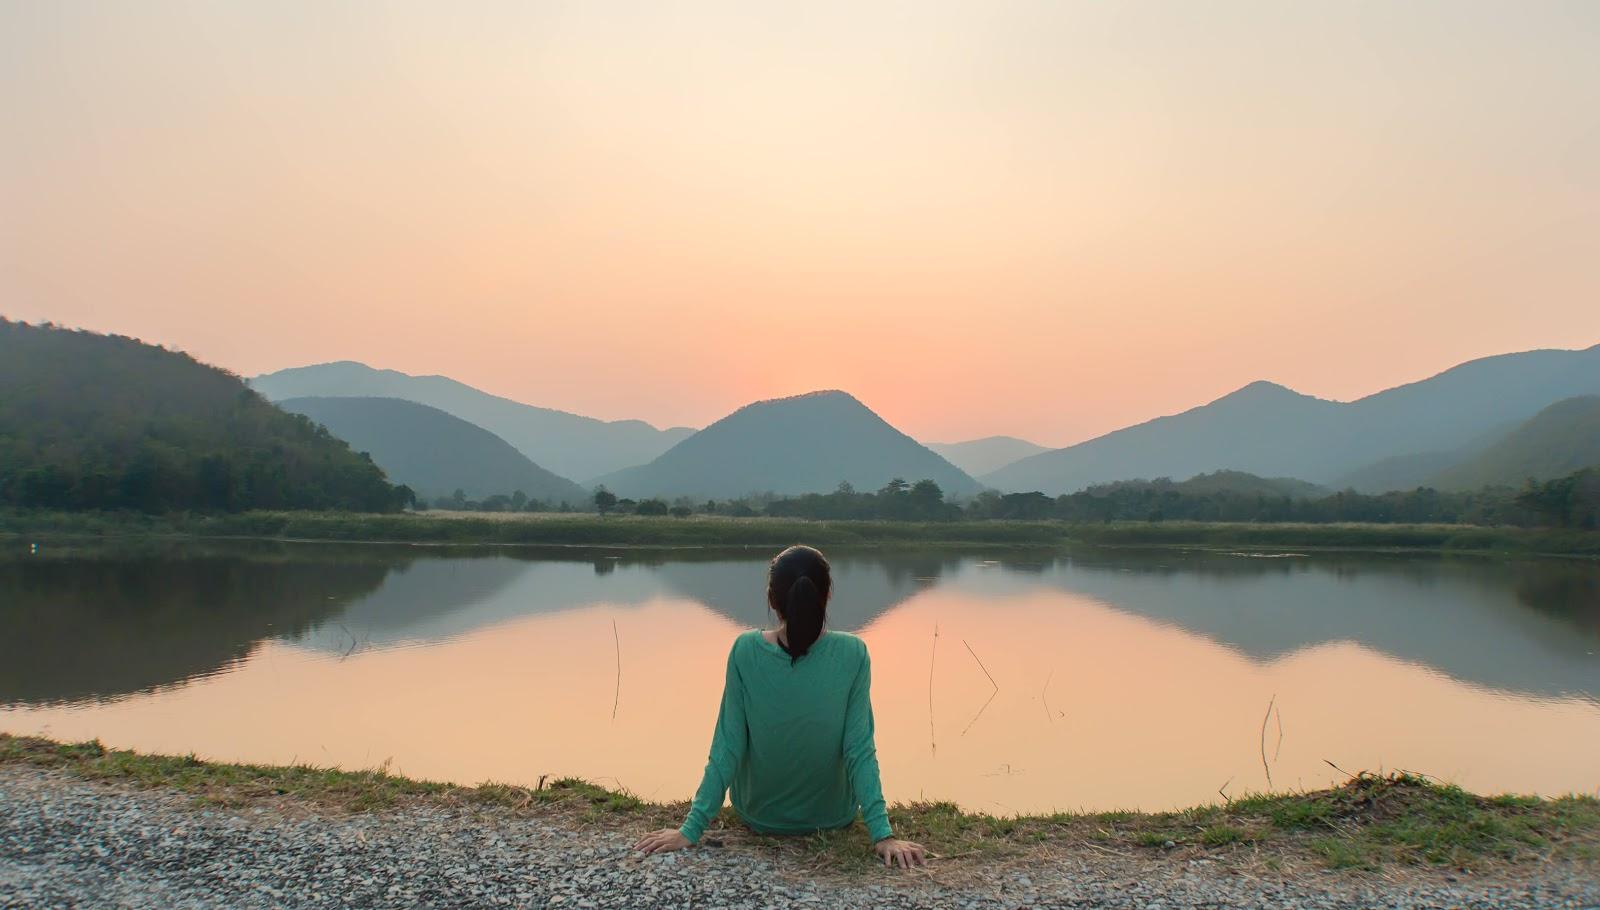 Woman enjoying a serene lake and mountain scene